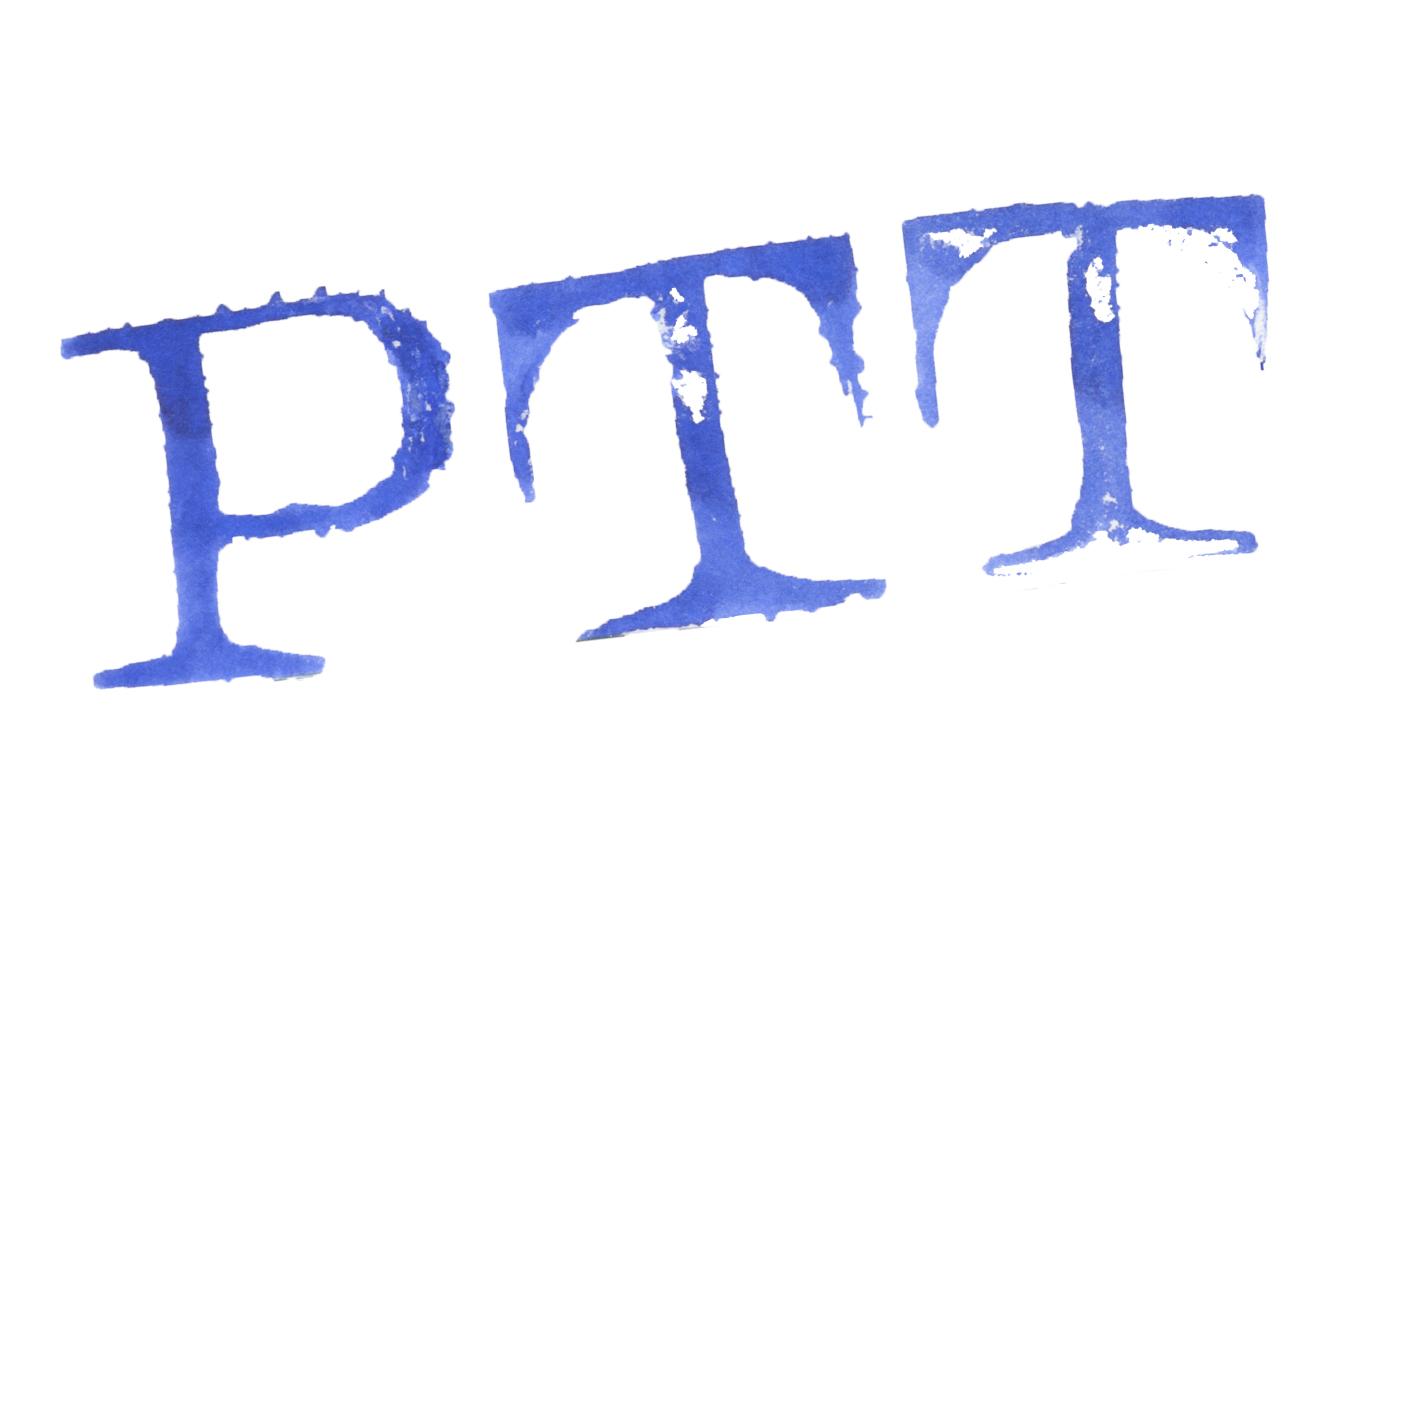 PTT CD opdruk def. hoge resolutie (melleboersma).jpg